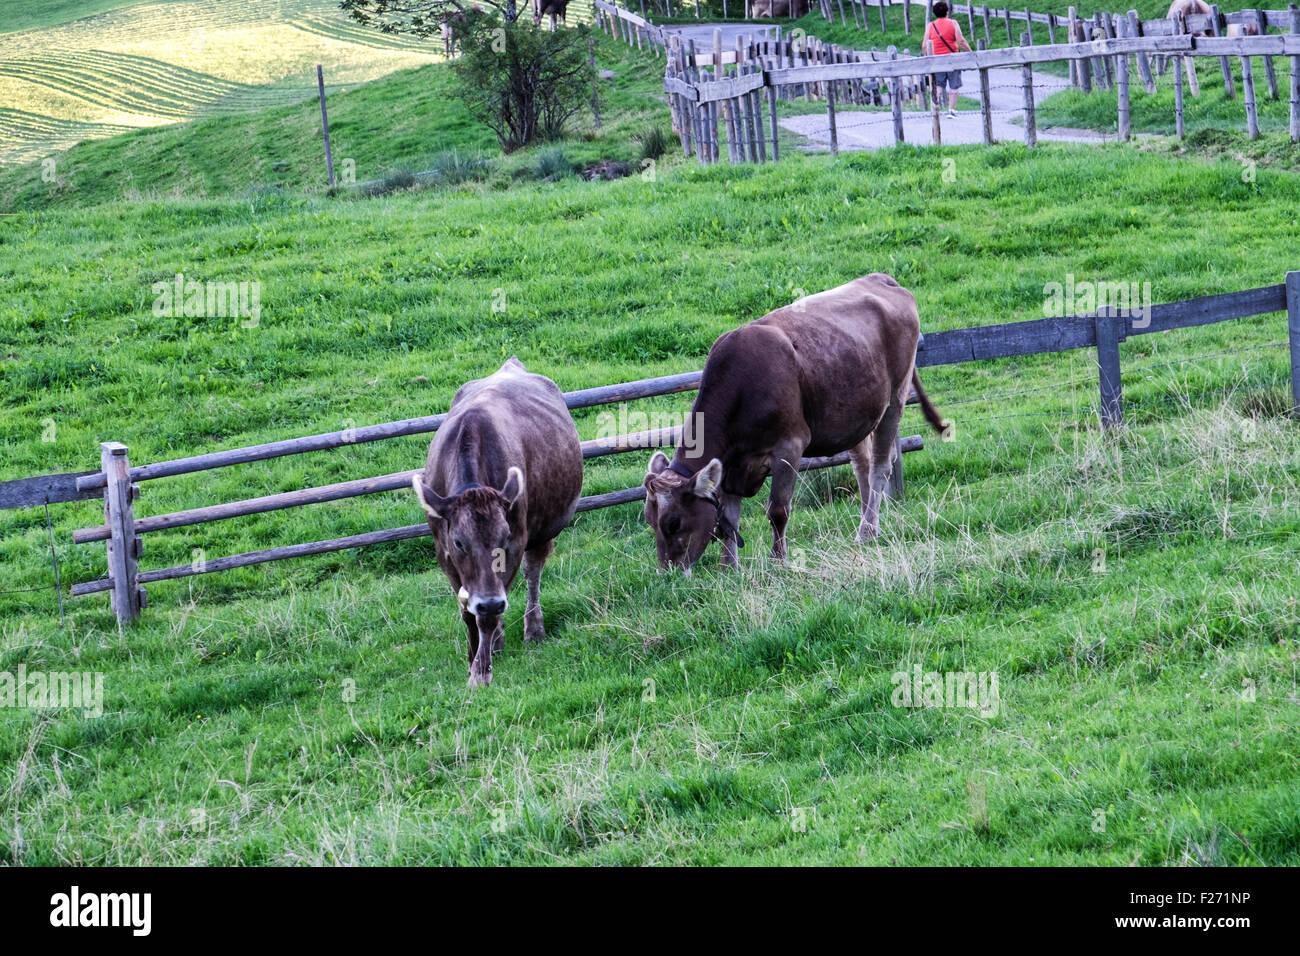 Cows grazing in lush farm meadow, Eisenberg, Eastern Allgaü, Bavaria, Germany - Stock Image